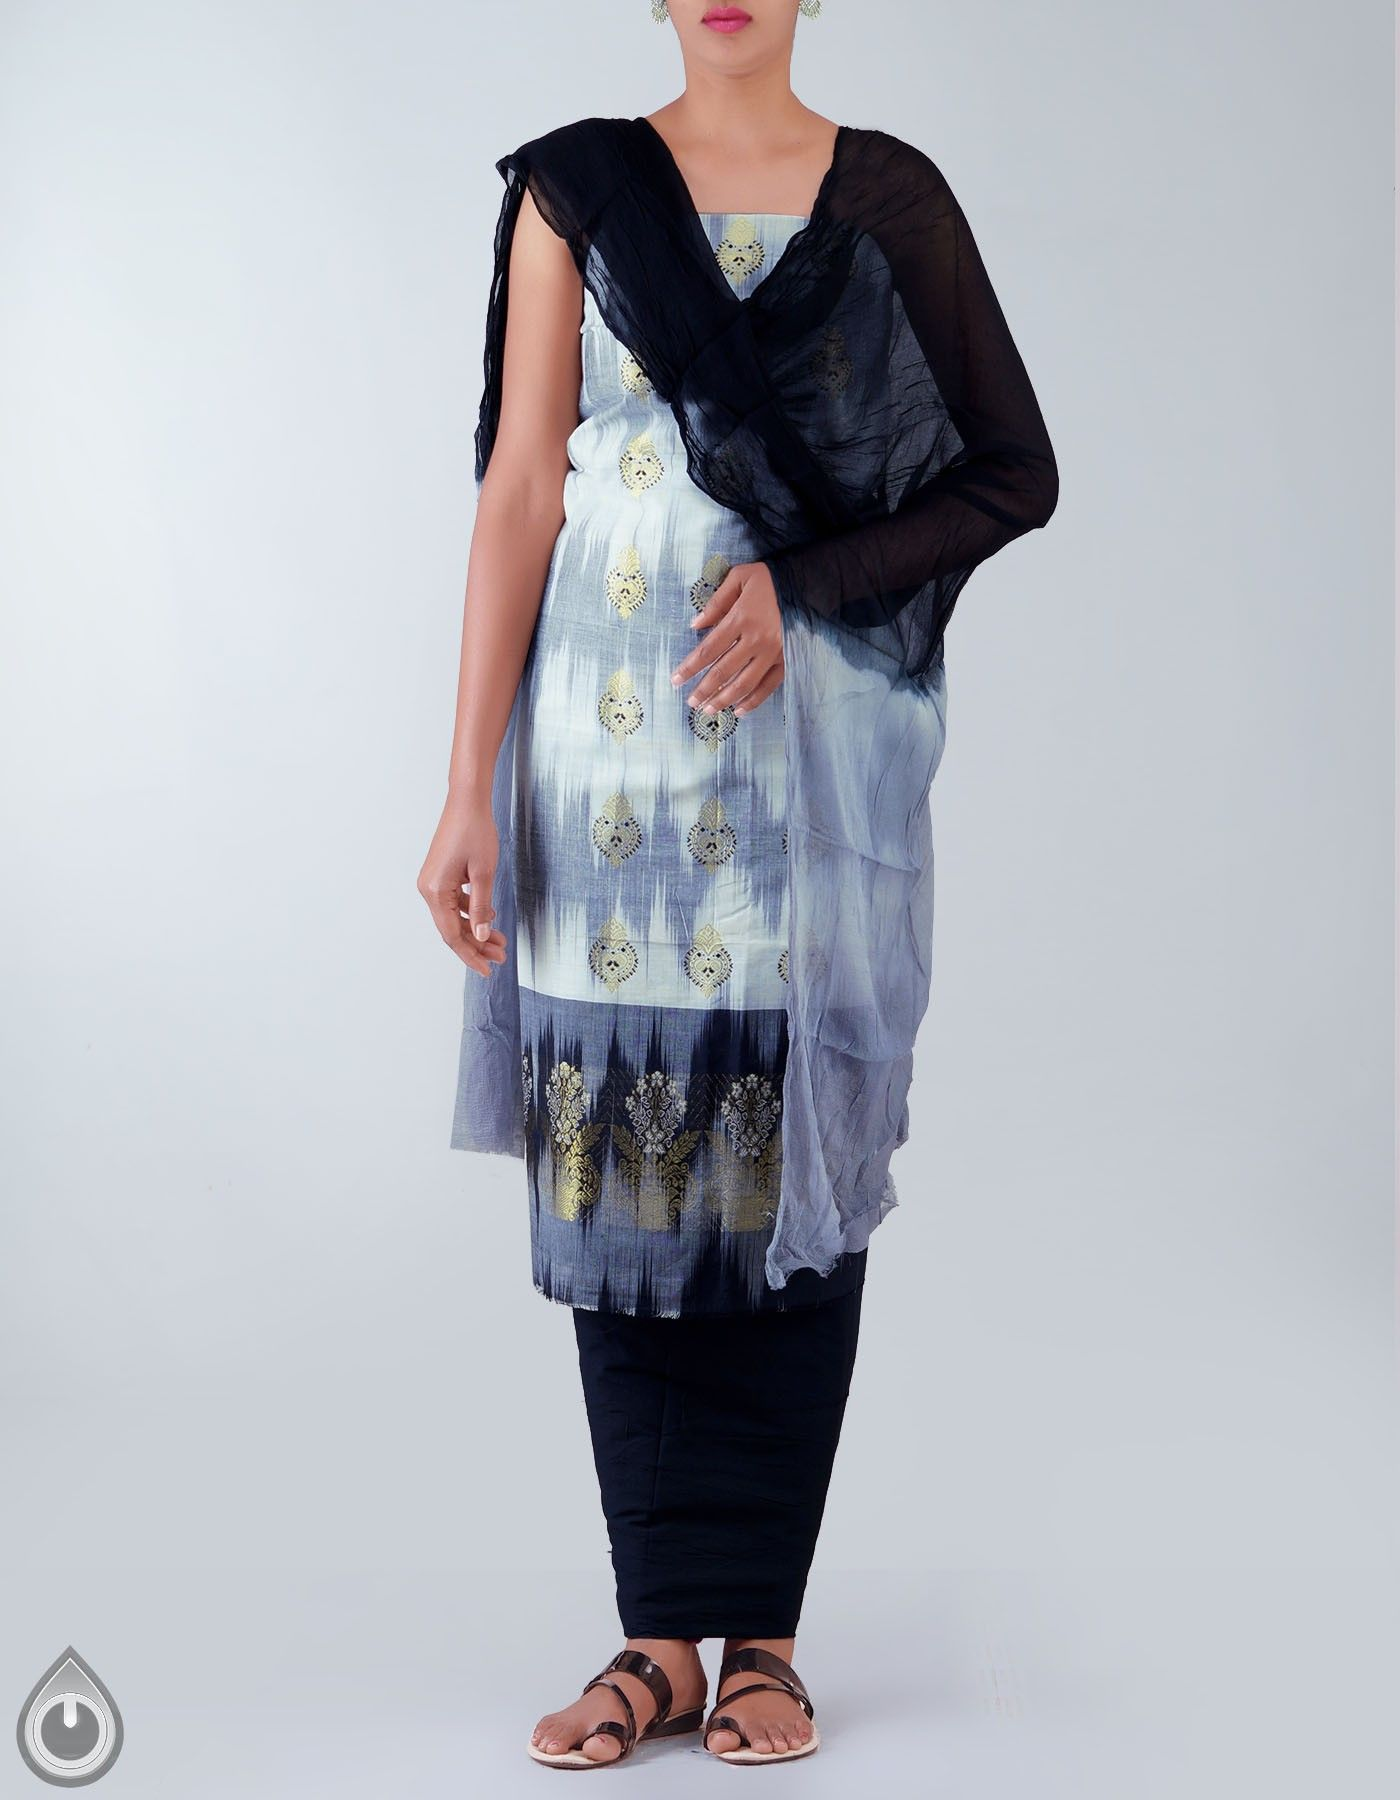 Unstitched white and black pure handloom kanchi cotton salwar kameez